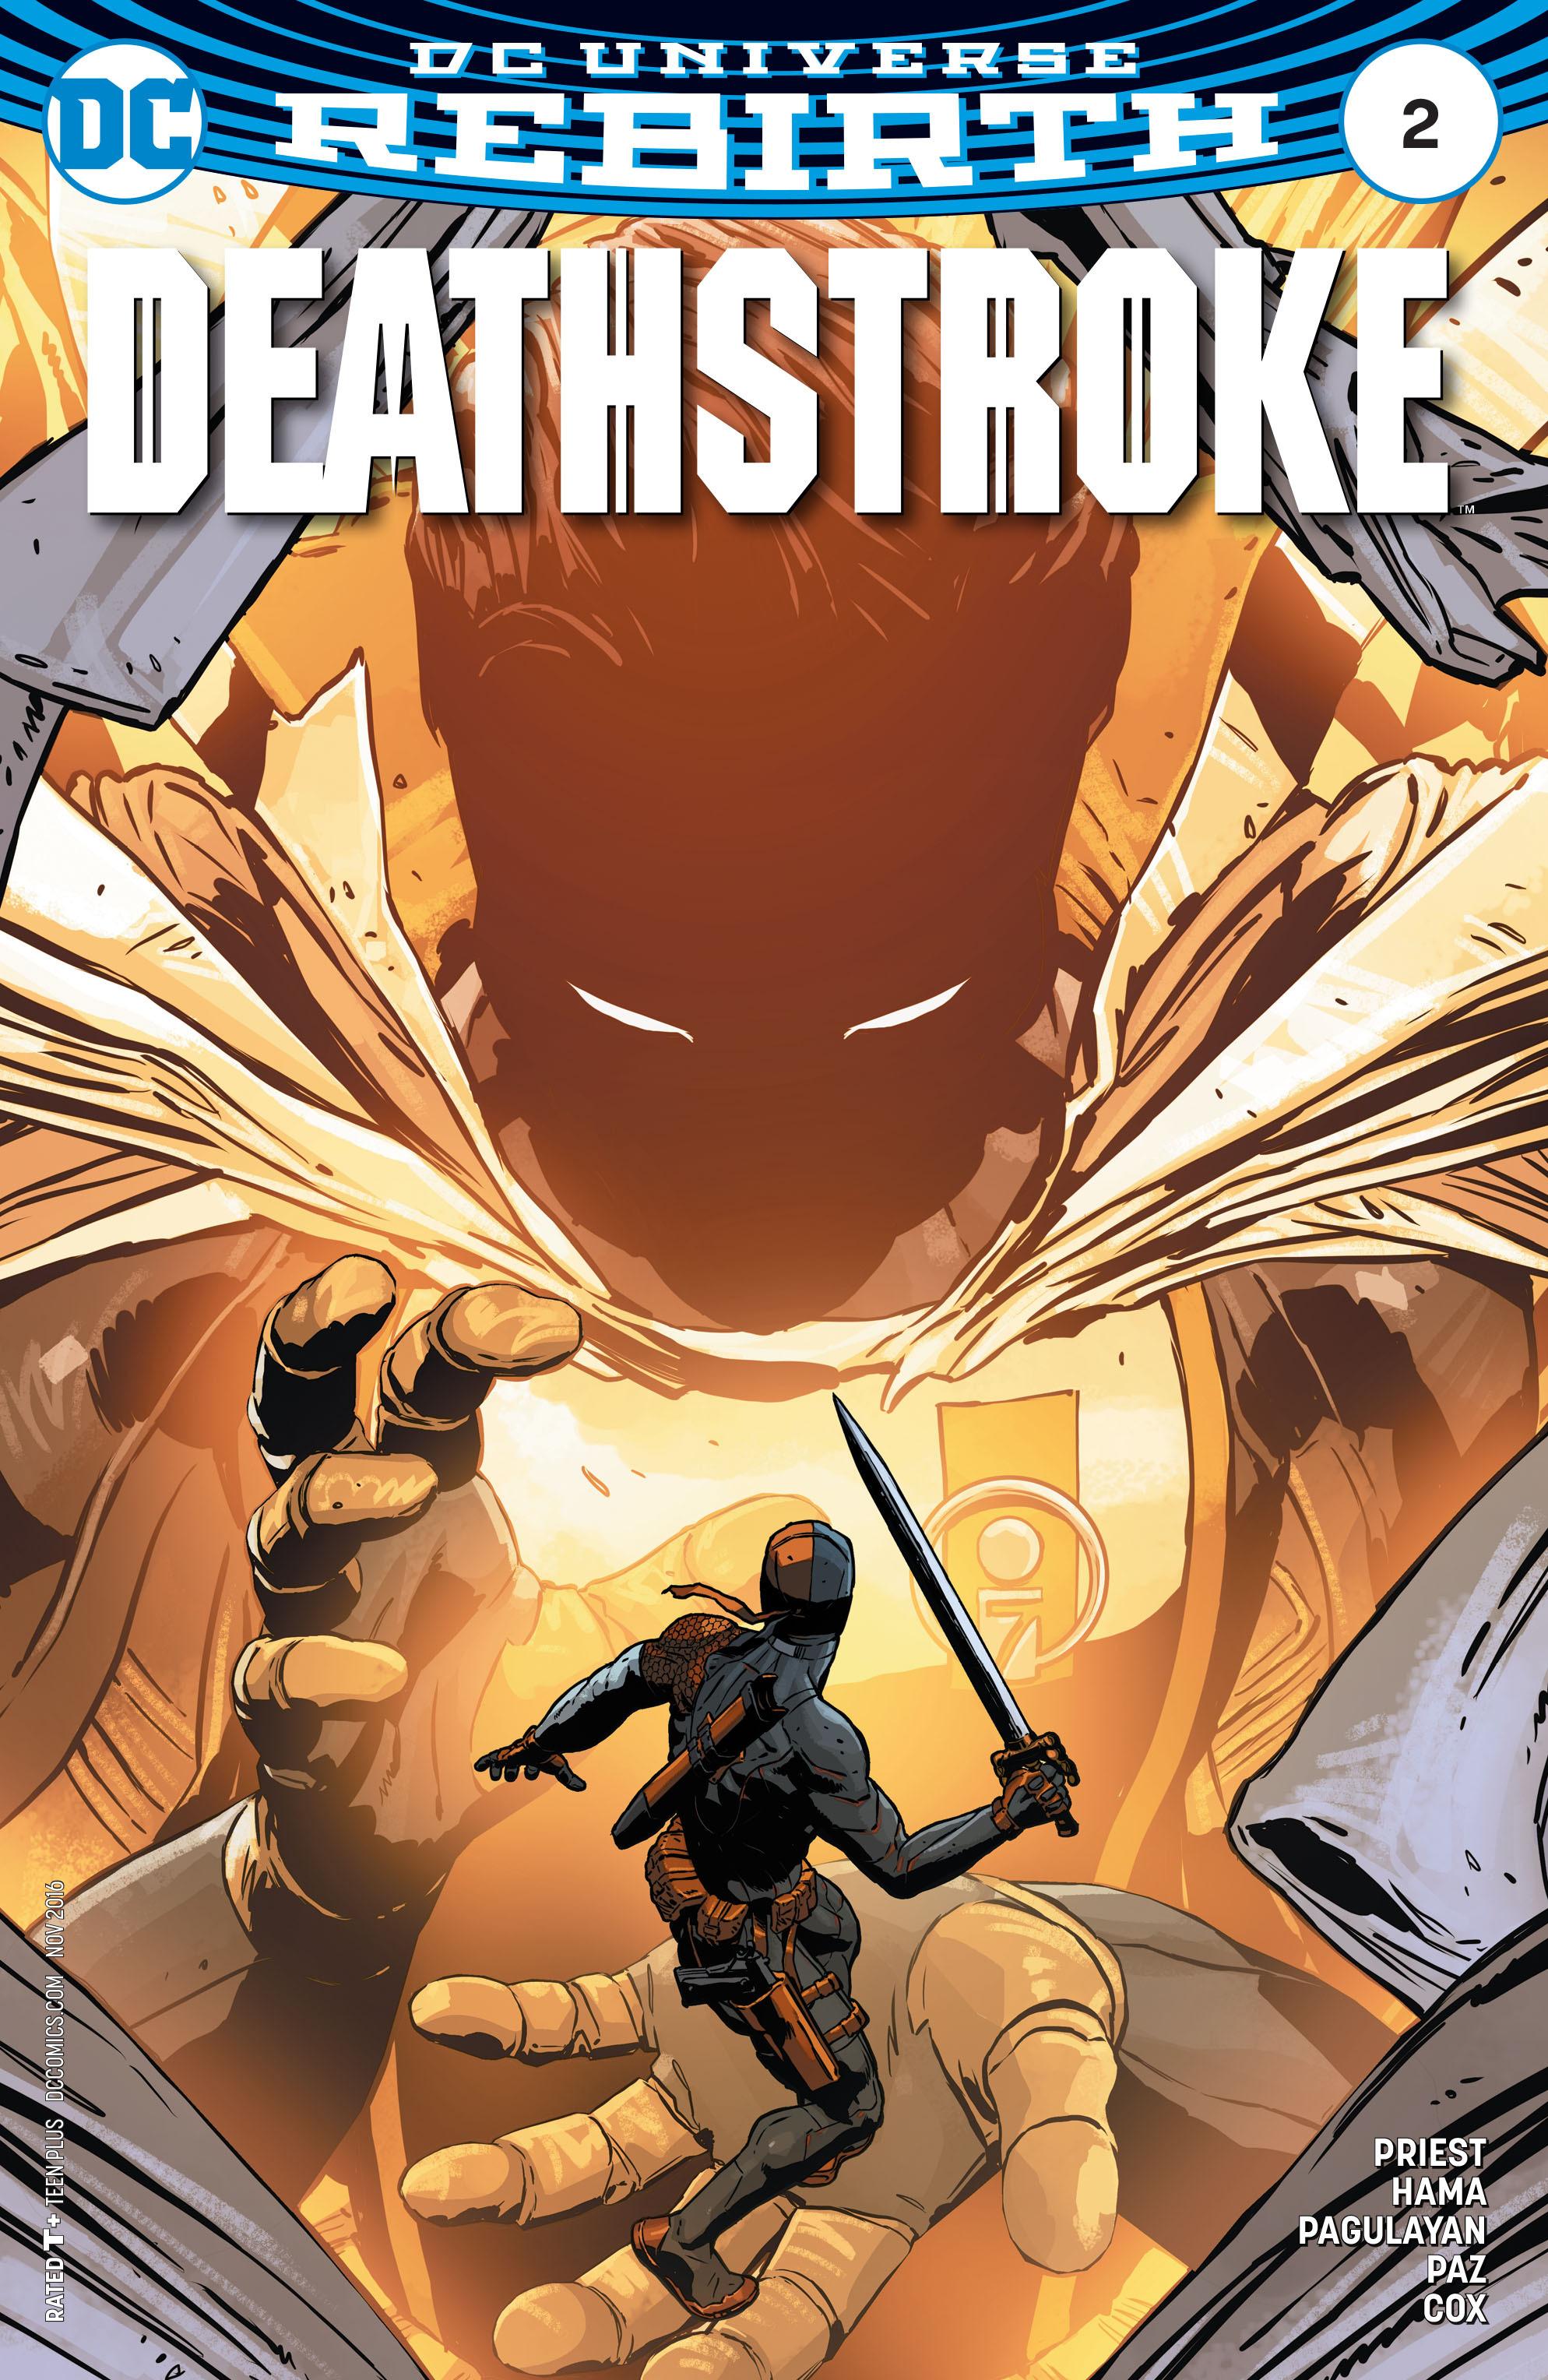 Deathstroke (2016) 2 Page 1